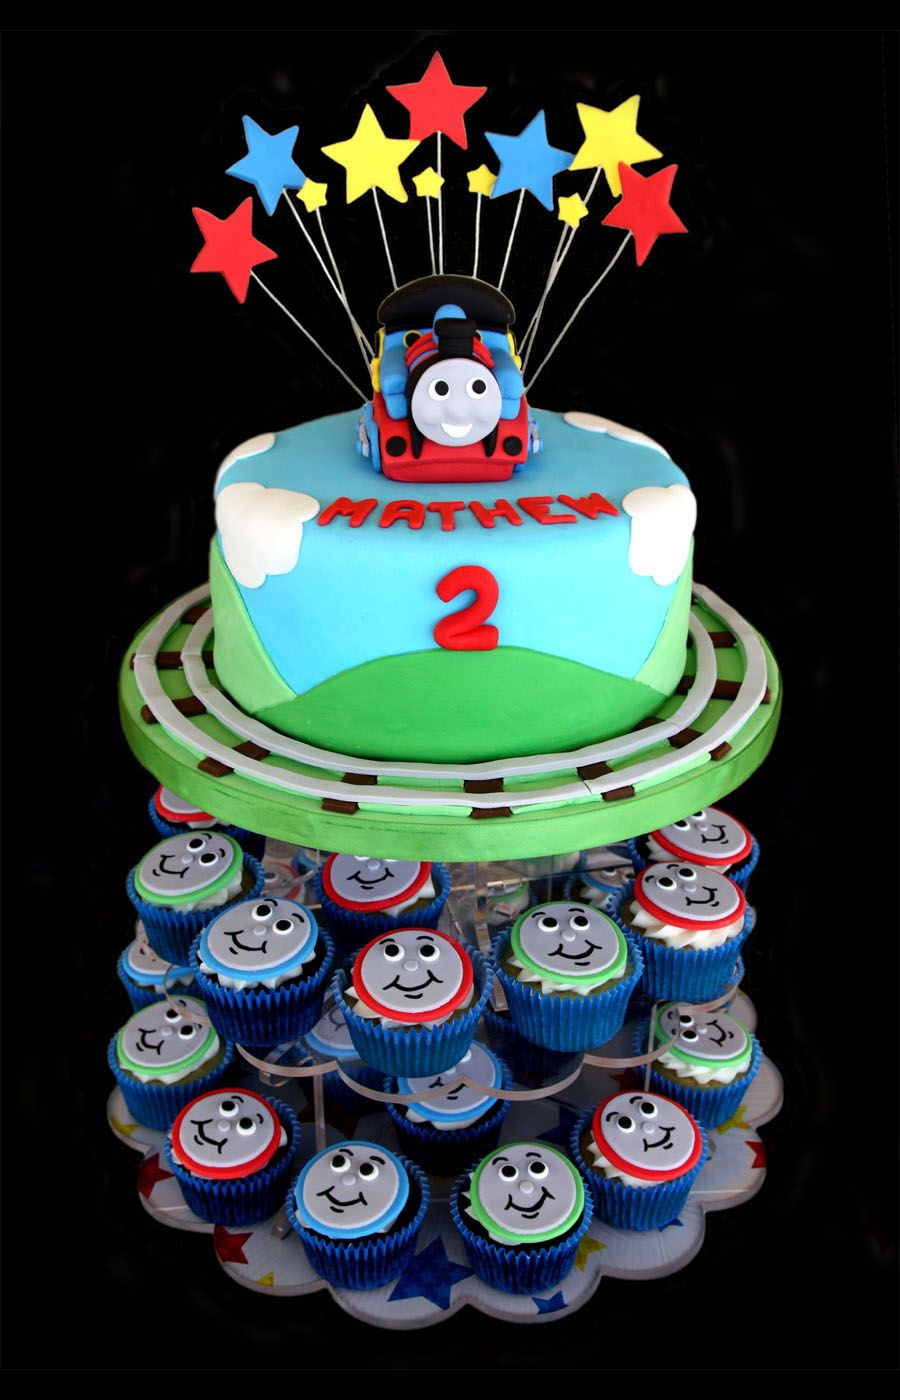 Thomas The Train Cake Custom Creations For Baby  Little Kids - Thomas birthday cake images